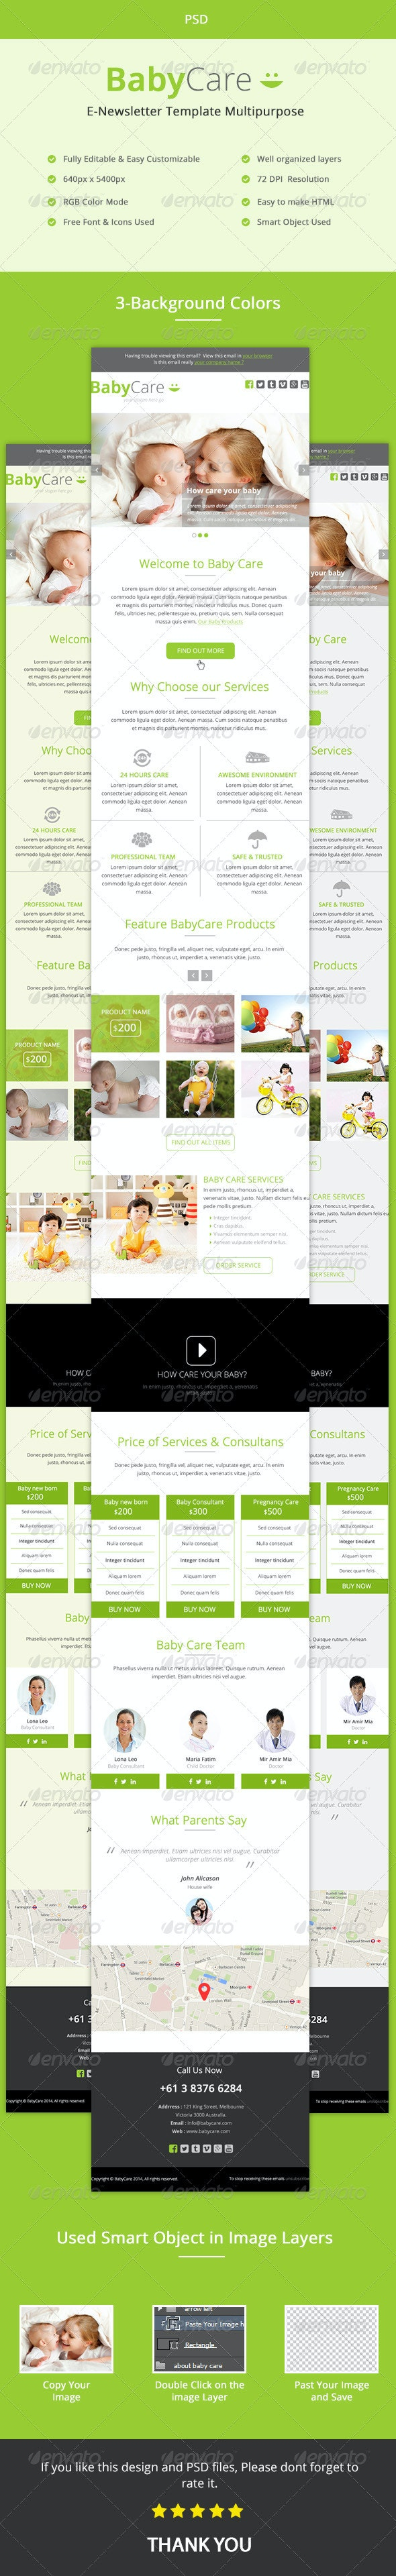 Baby Care- Multipurpose E-newsletter PSD Template